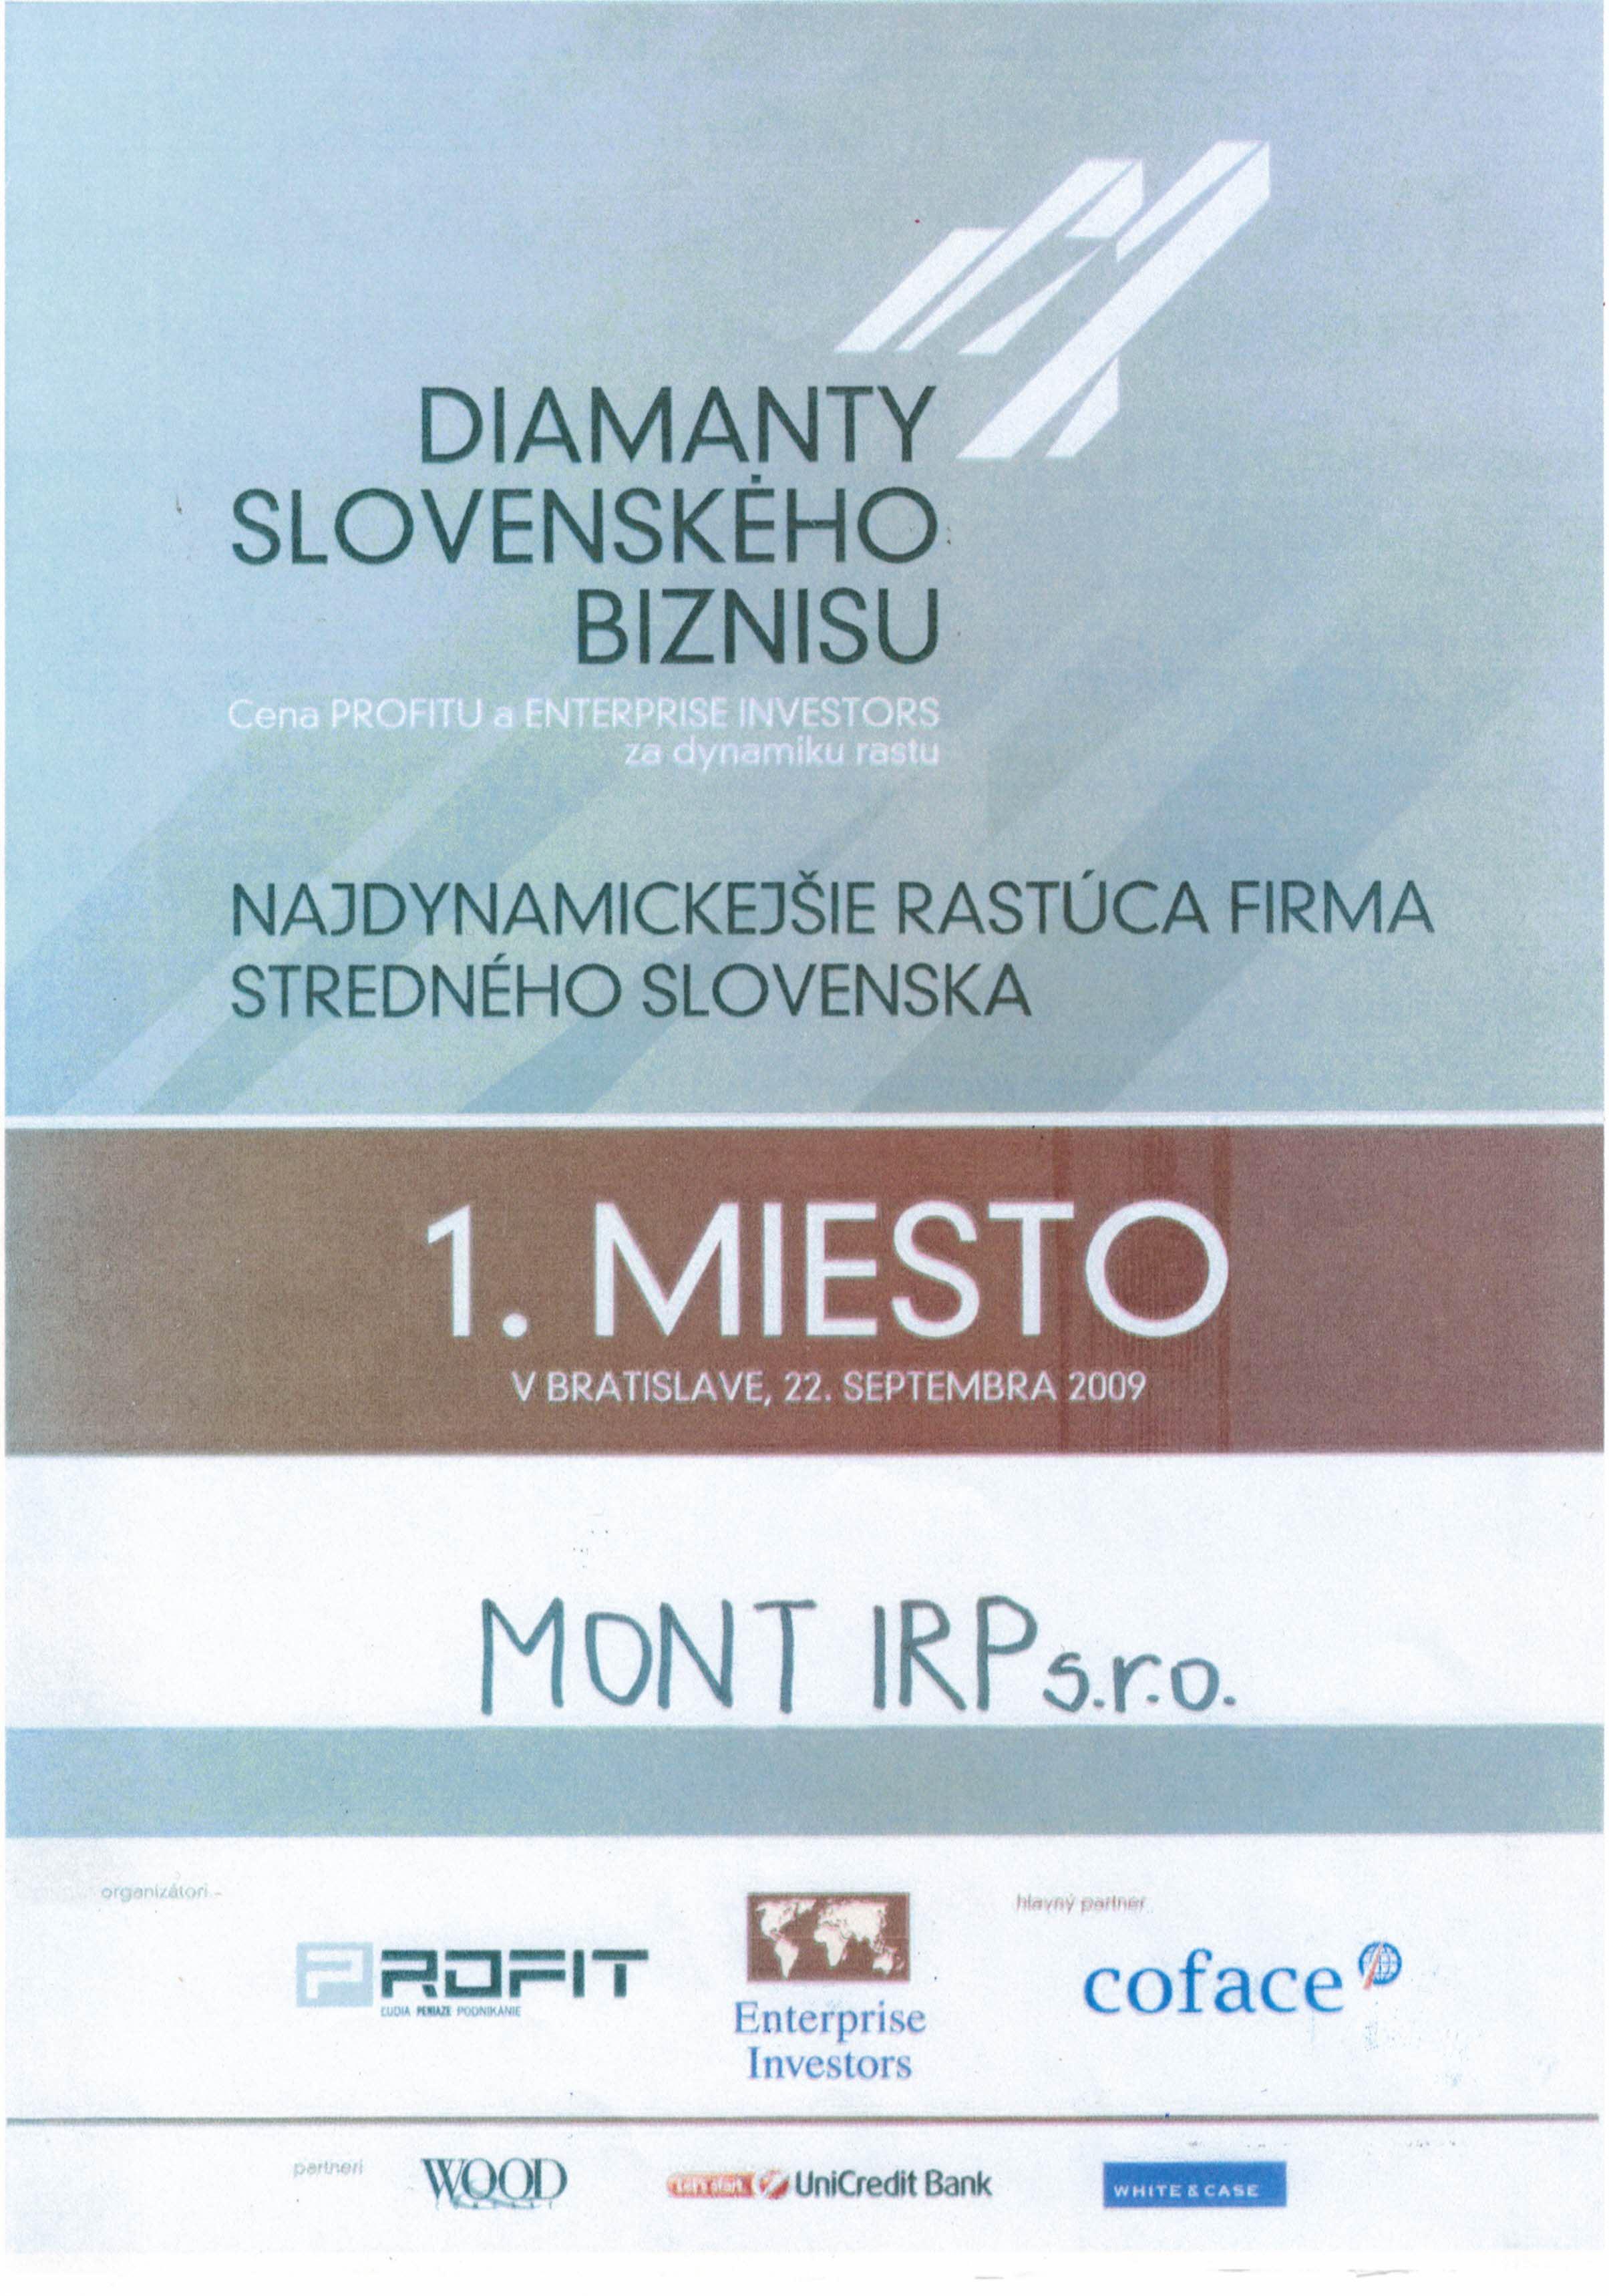 1.miesto-Diamanty Slovenkého biznisu-2009